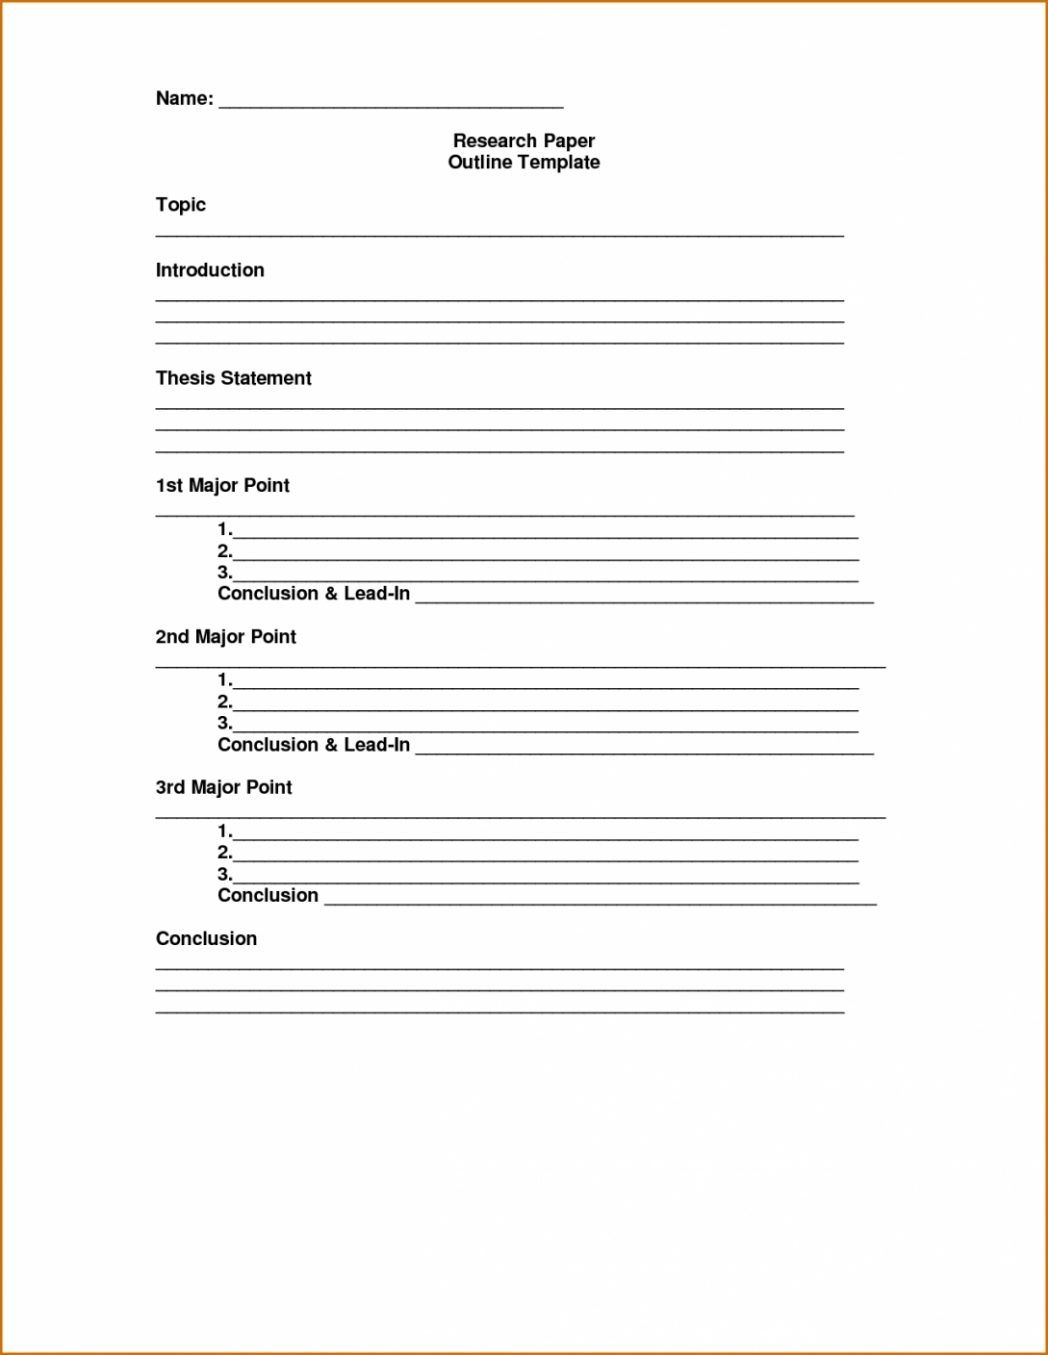 Argumentative Essay Outline Worksheet 1279578 Myscres High Scho With Regard To Argumentati Research Paper Outline Template Essay Outline Essay Outline Template